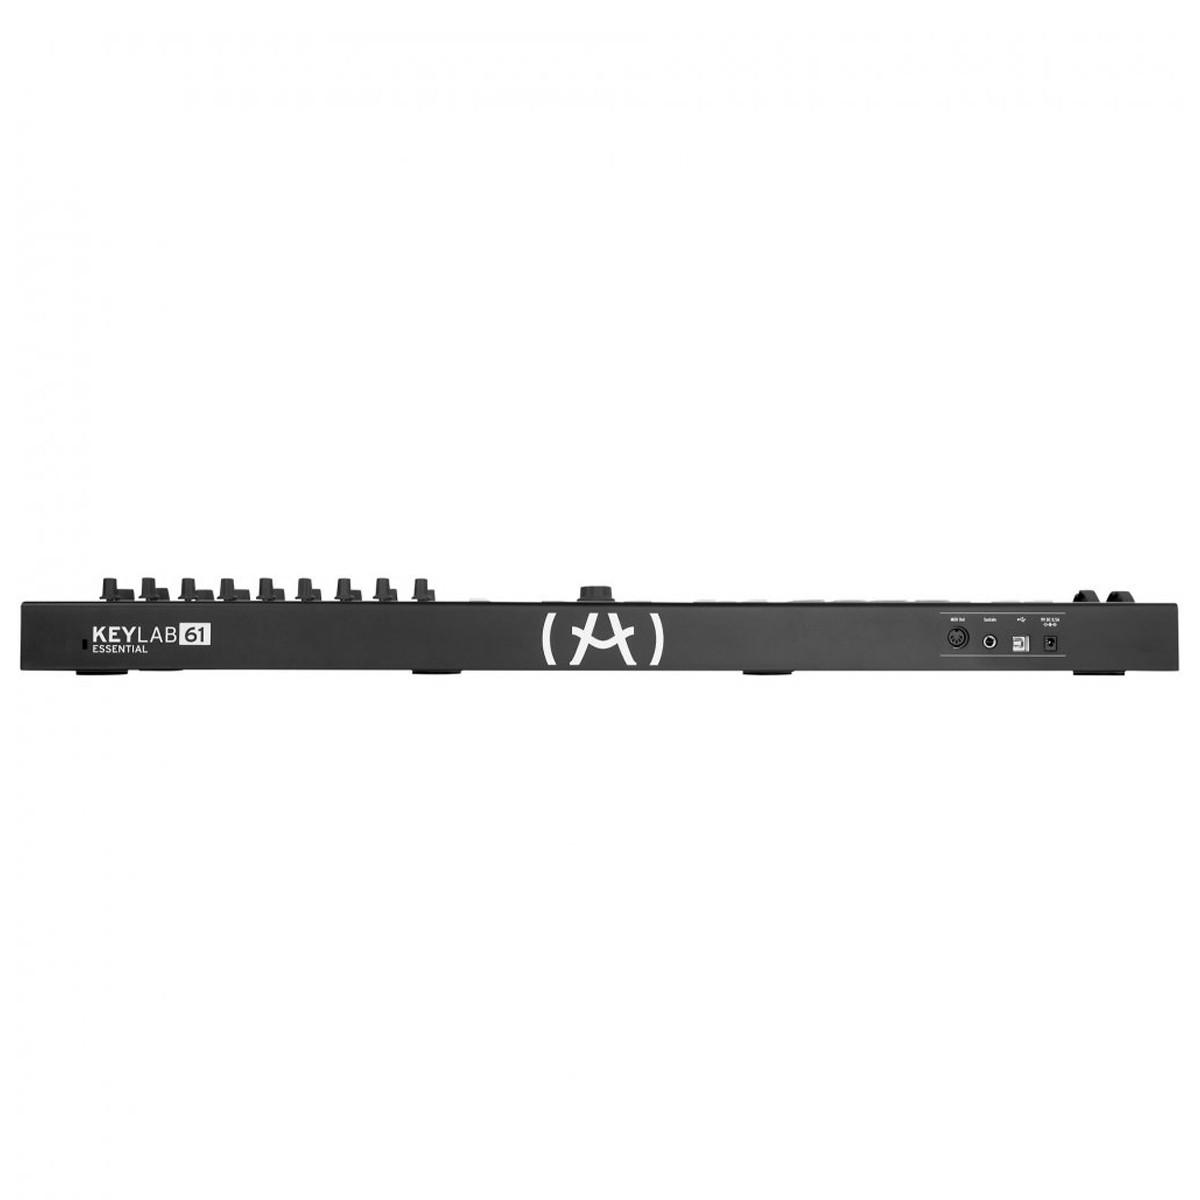 Teclado Controlador Arturia KeyLab Essential 61 Black